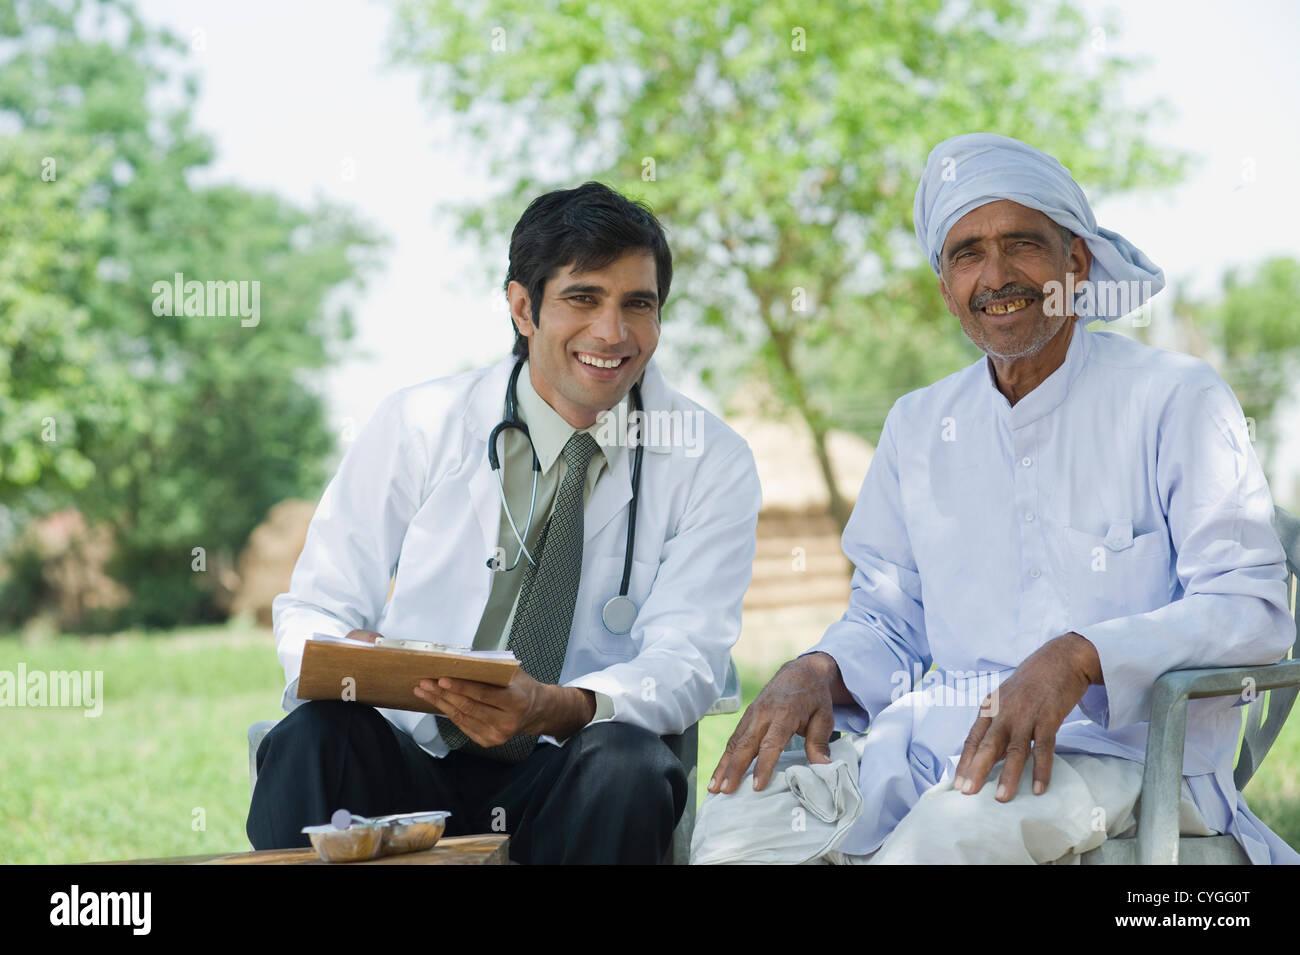 Doctor writing a prescription for a farmer - Stock Image